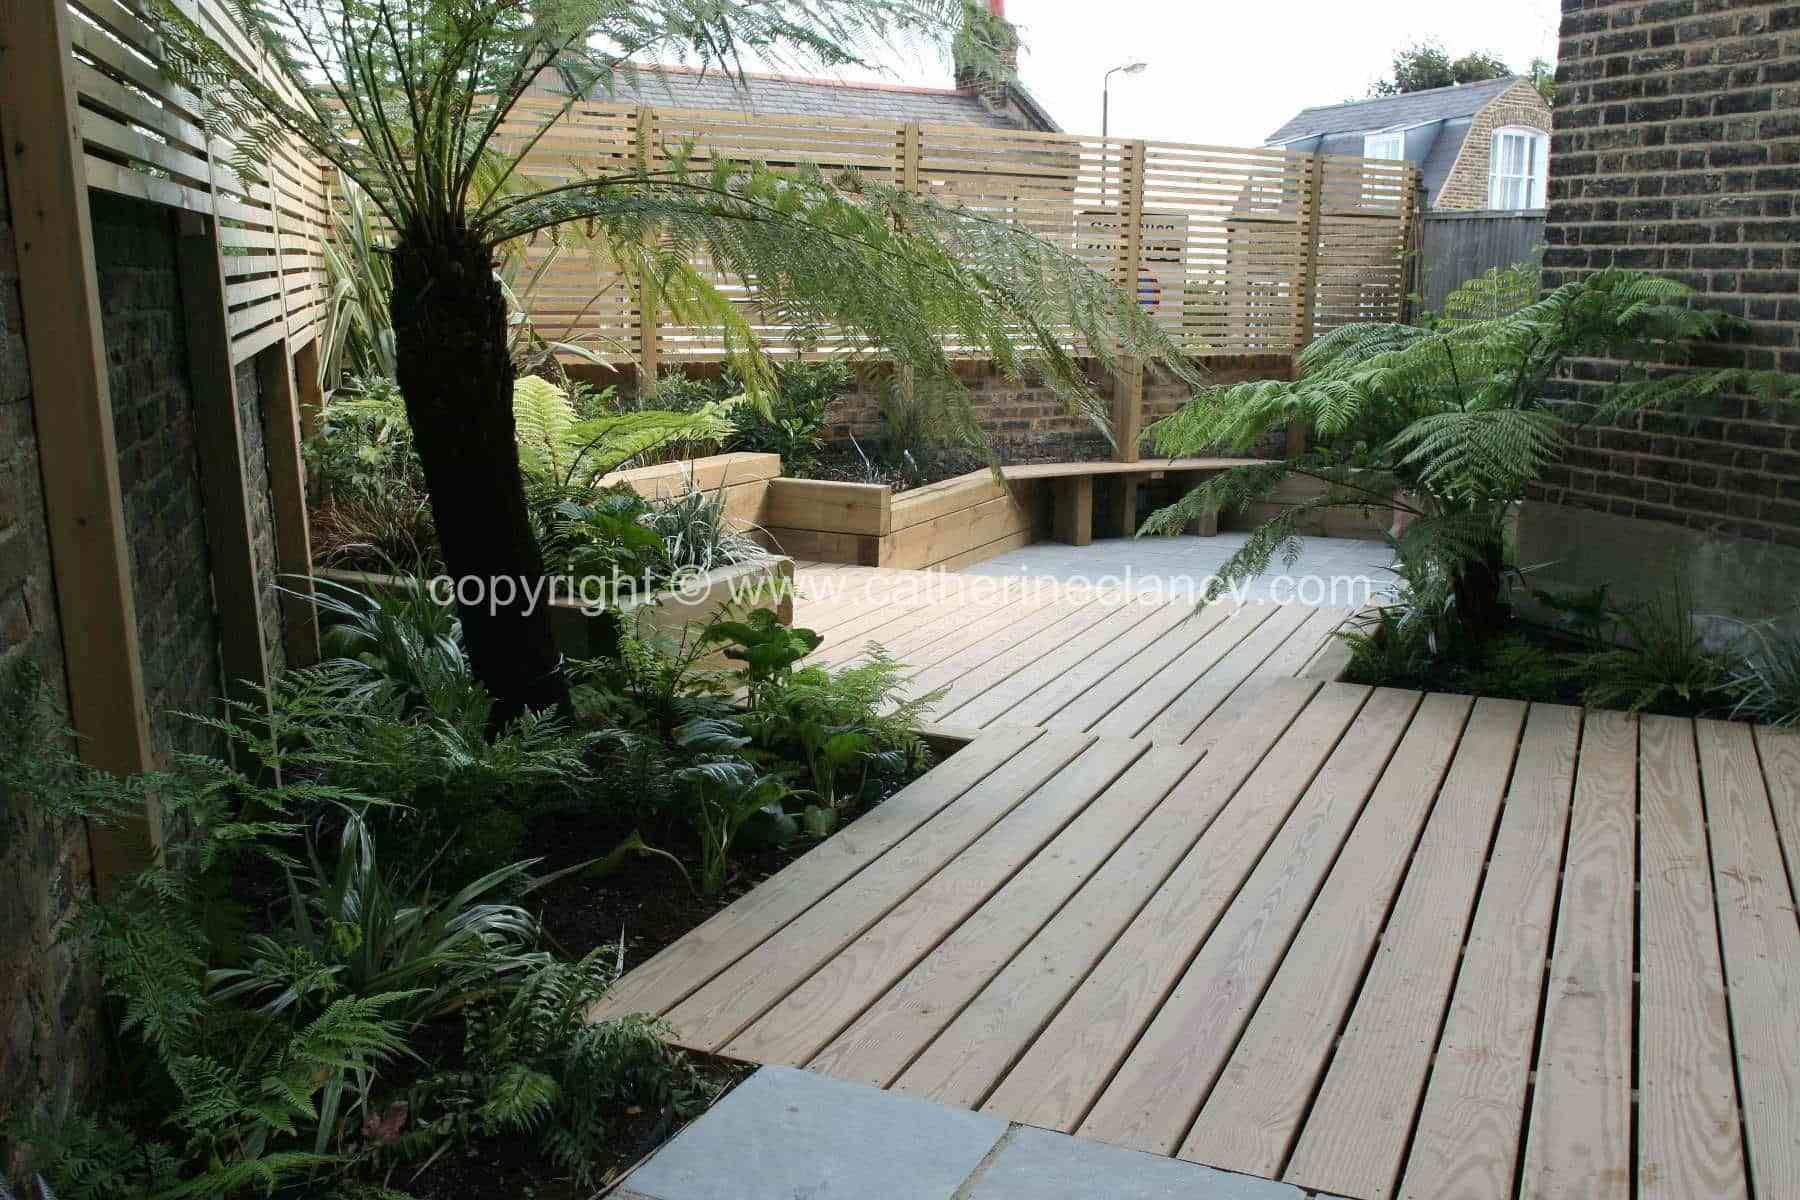 New Zealand Garden 1 Garden Landscape Design Garden Design London Patio Landscape Design